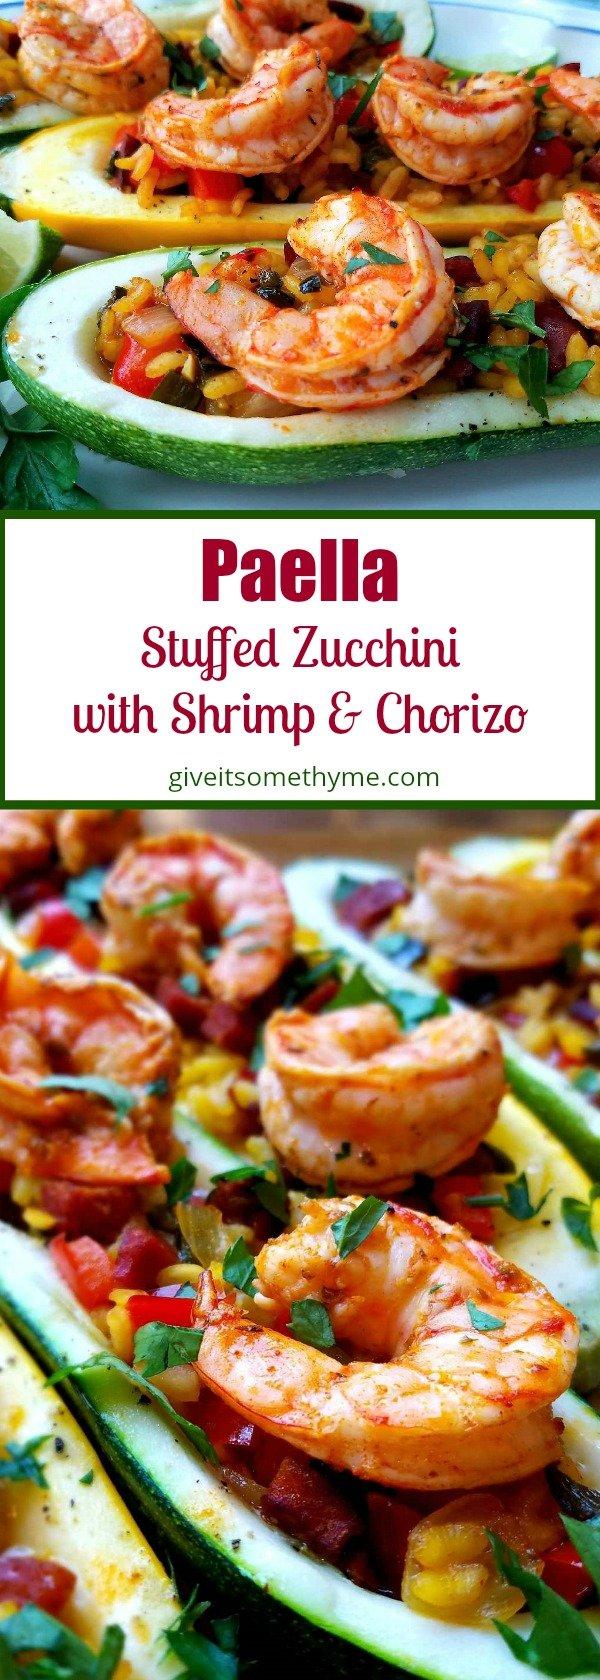 Paella Stuffed Zucchini with Shrimp & Chorizo - Give it Some Thyme